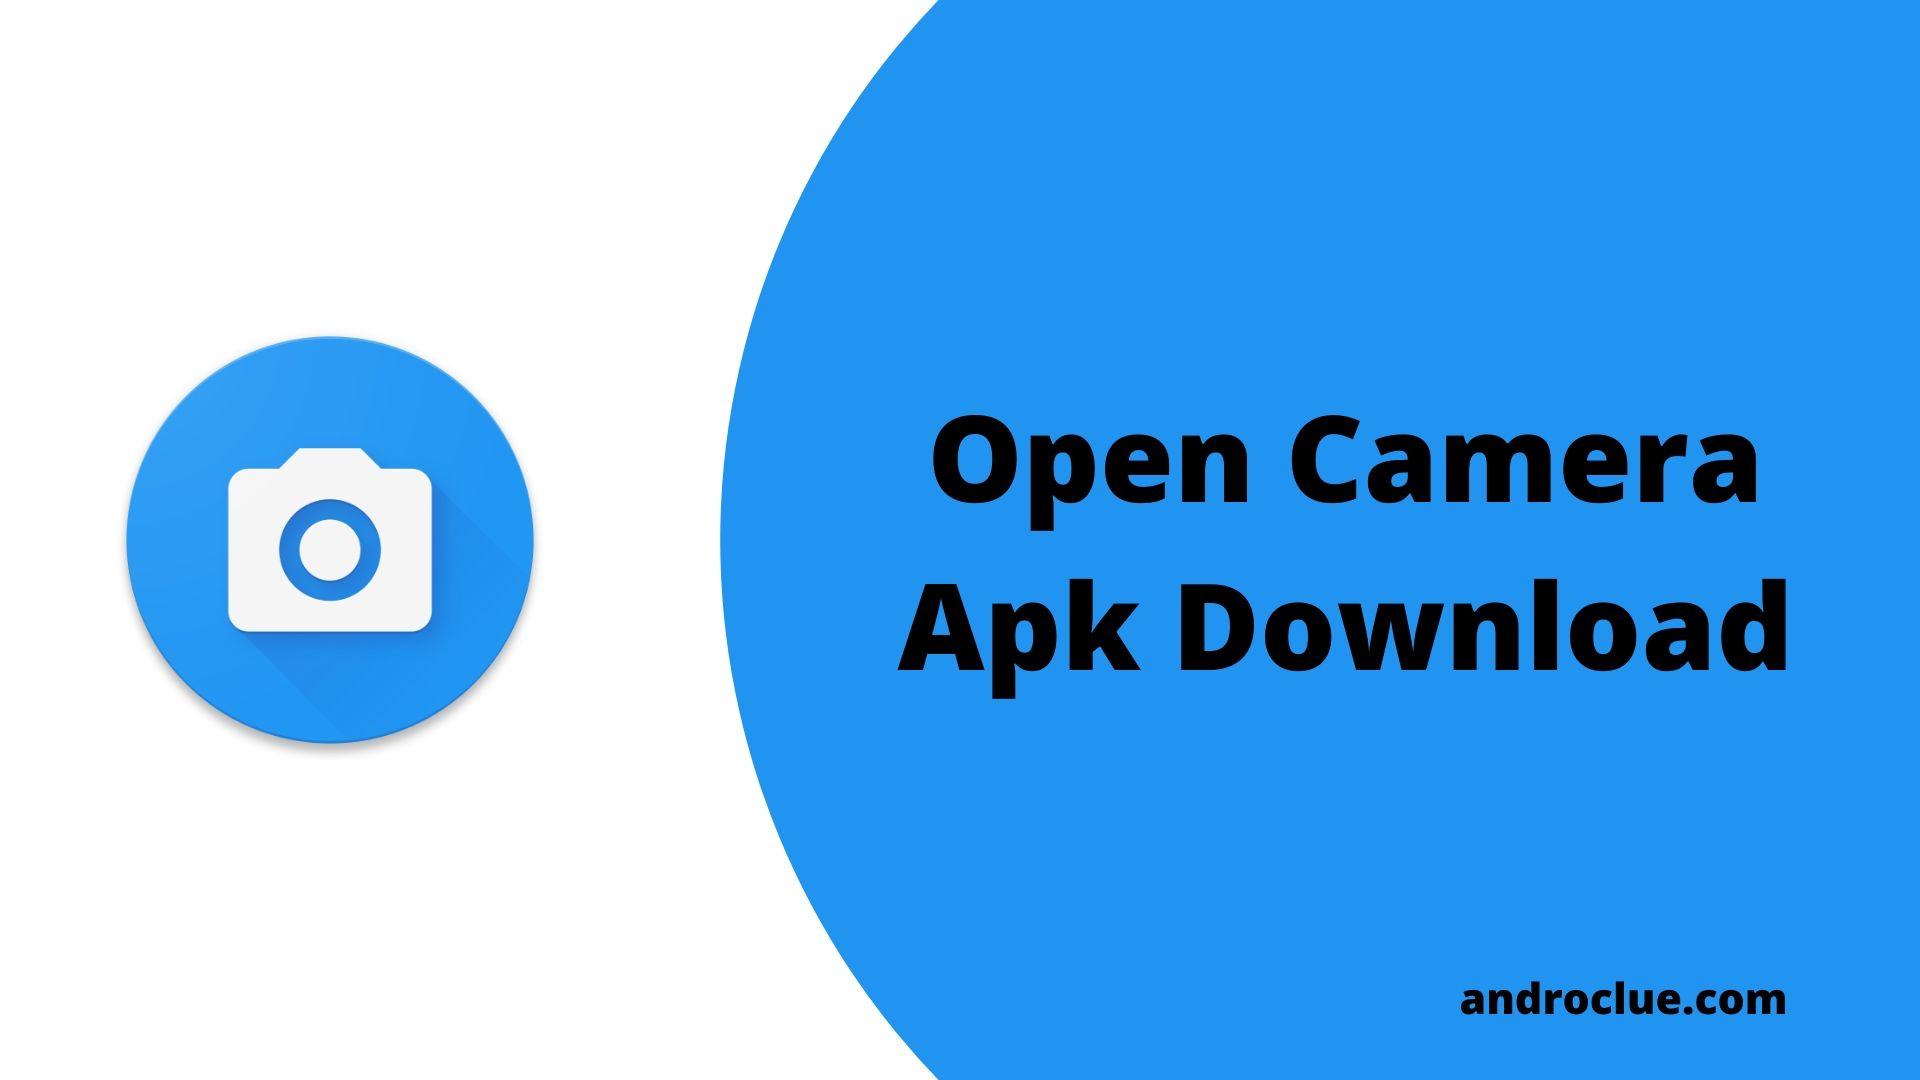 Open Camera Apk